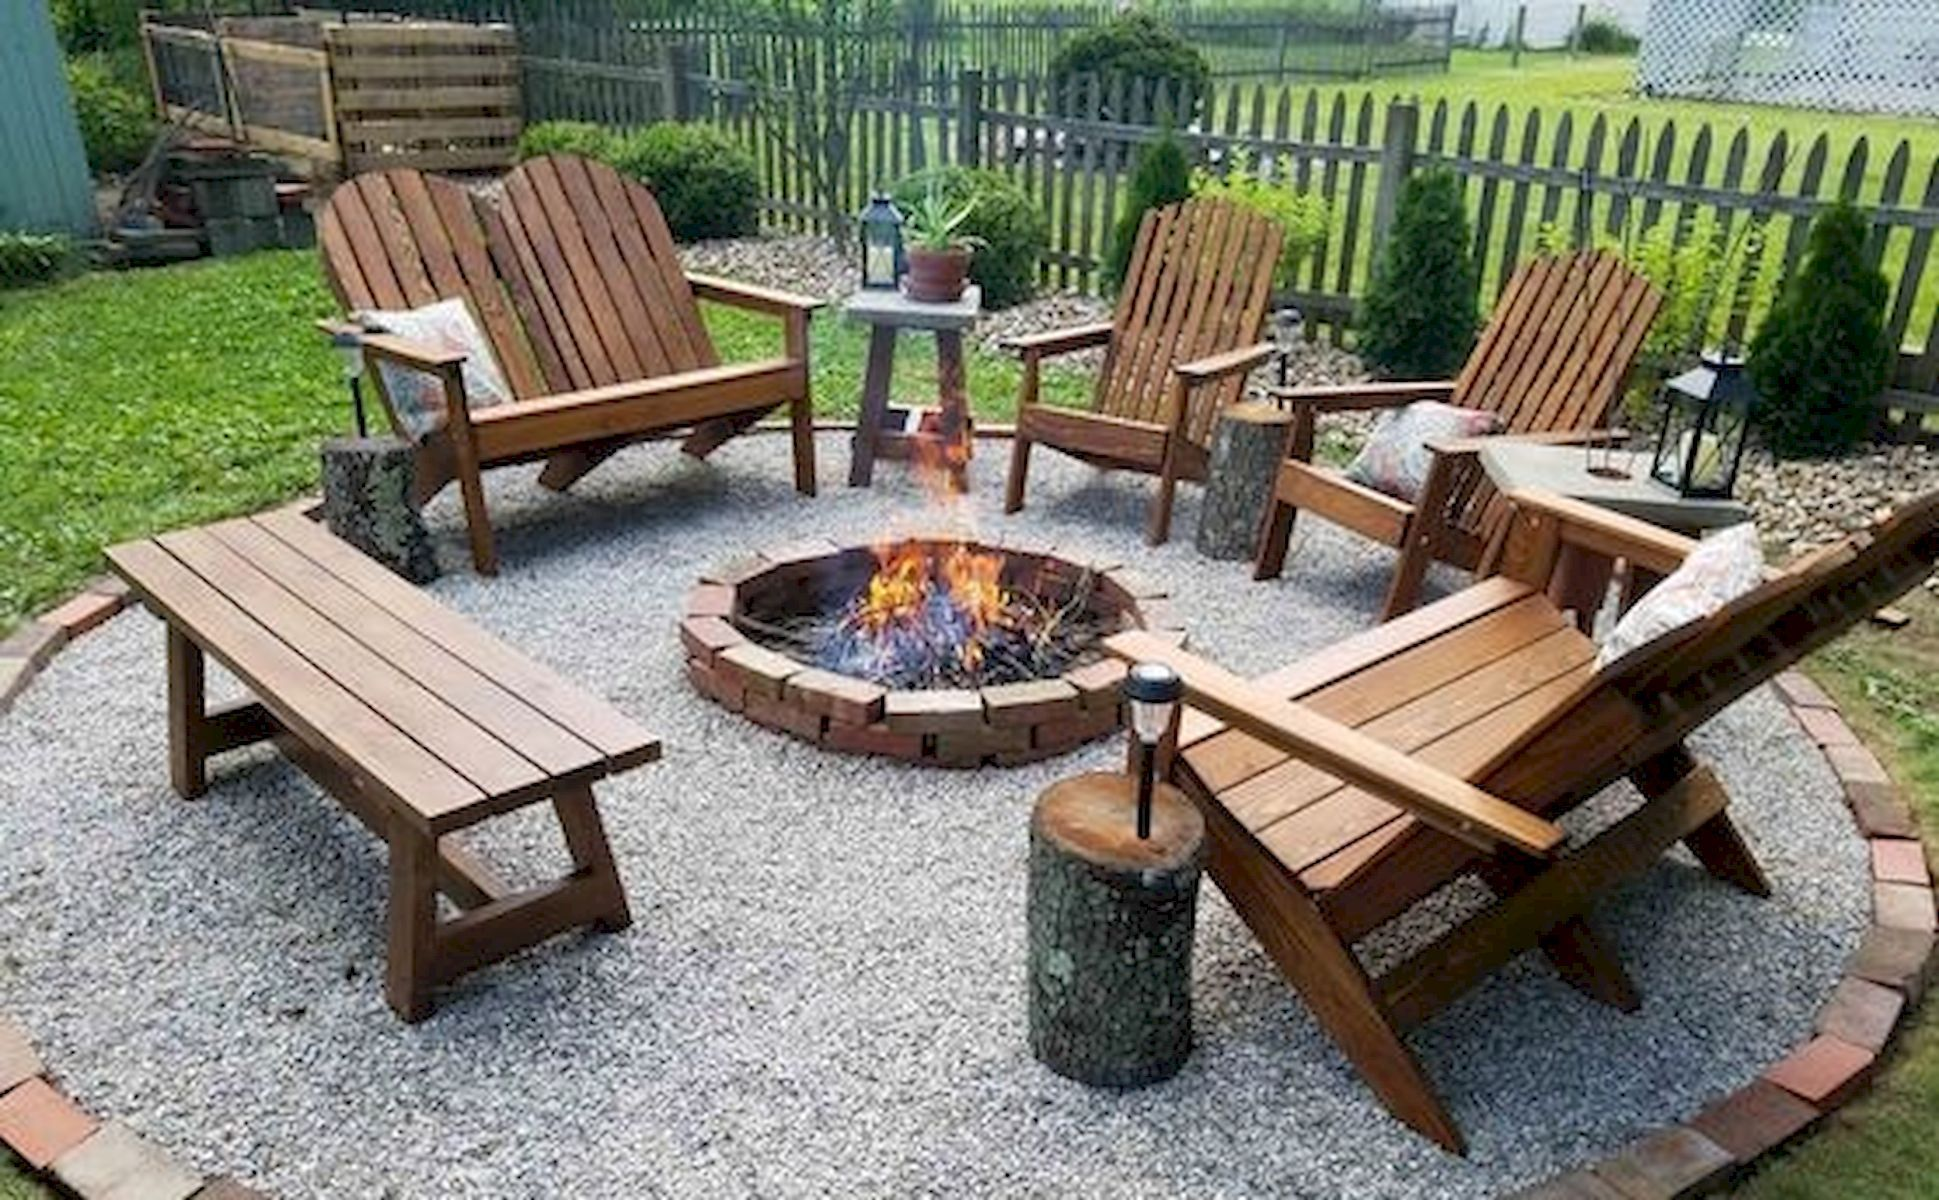 Deco Terrasse Bois Flotté 50 magical outdoor fire pit design ideas   foyer jardin